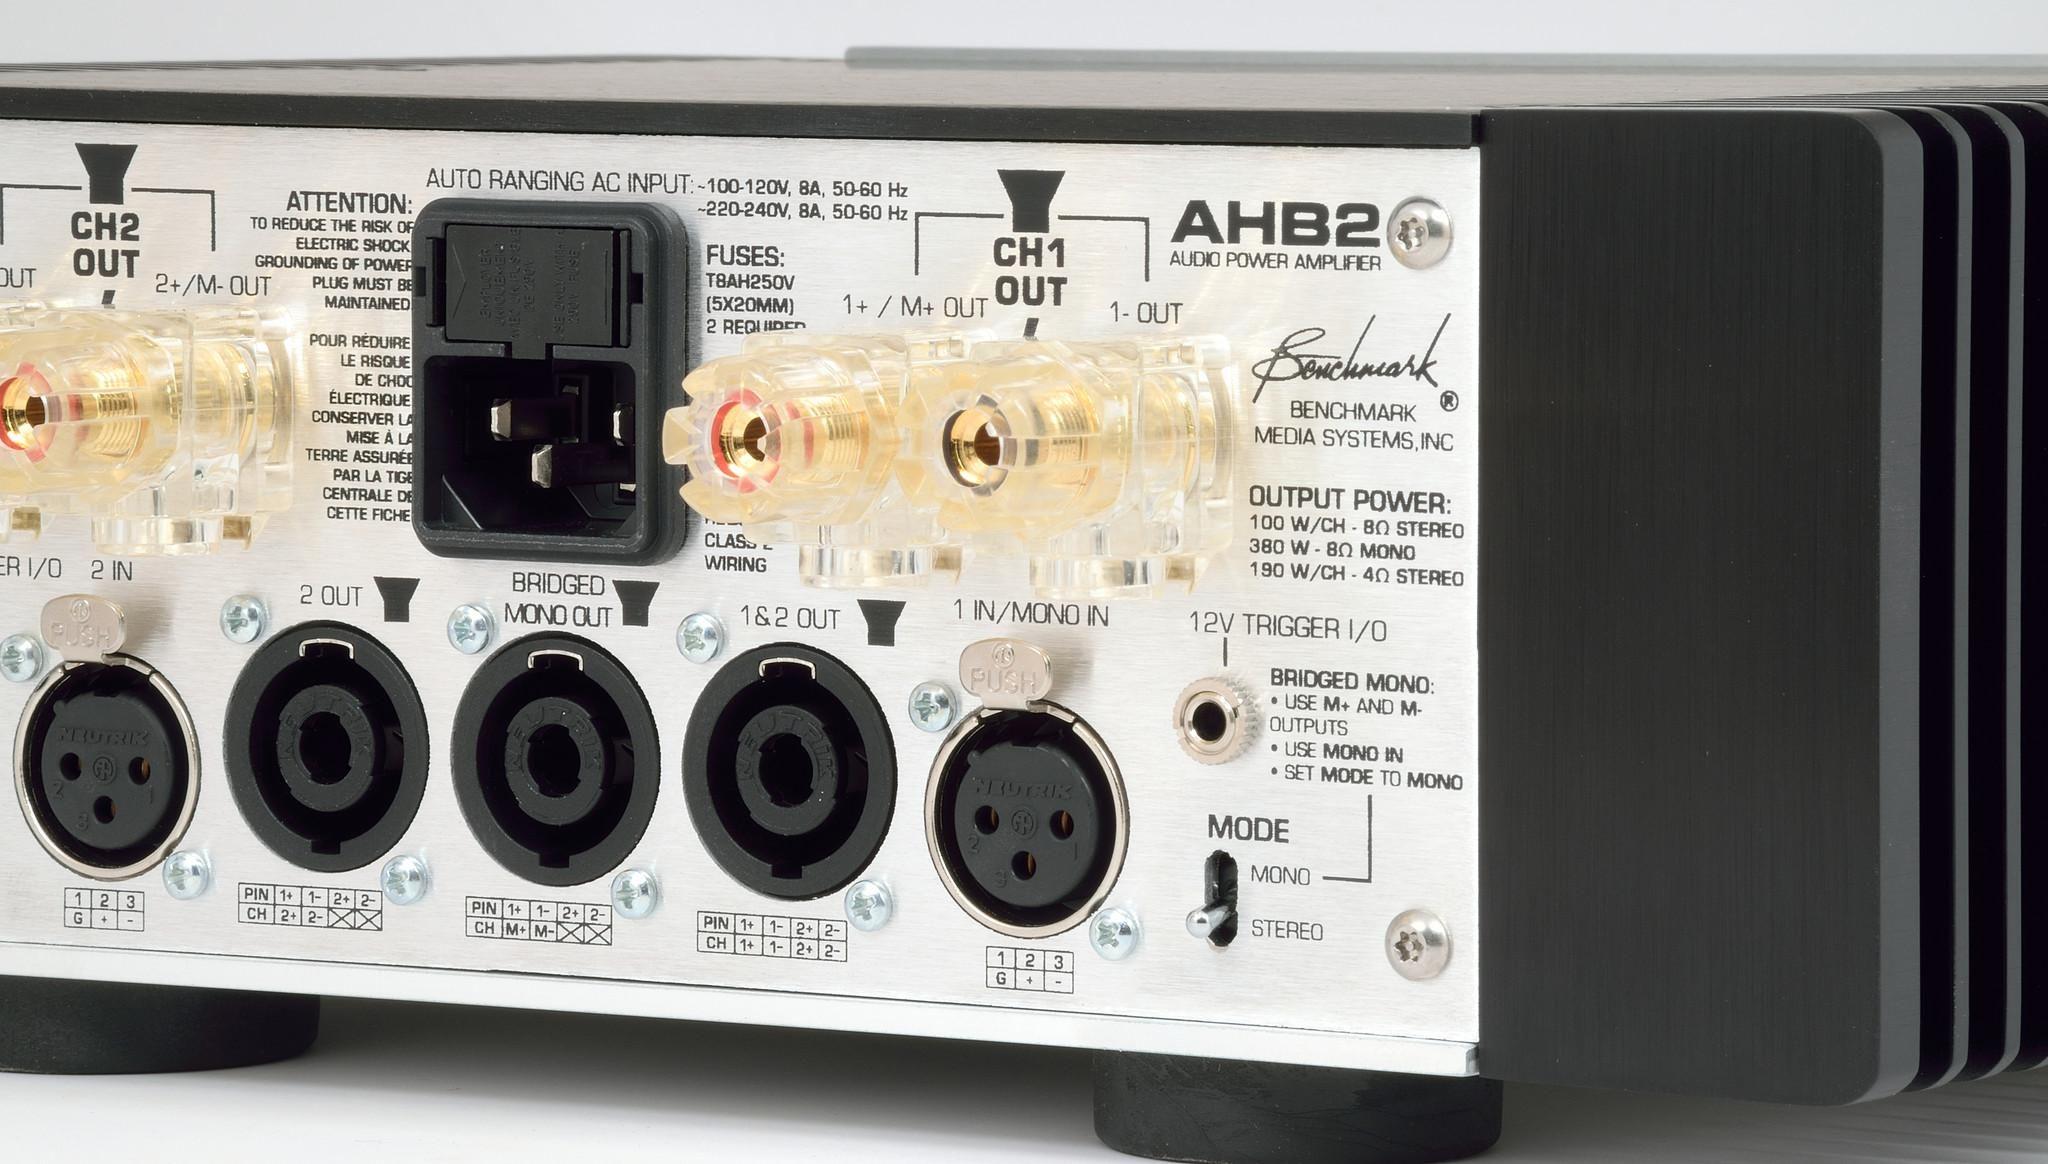 Benchmark AHB2 Power Amplifier   hifi